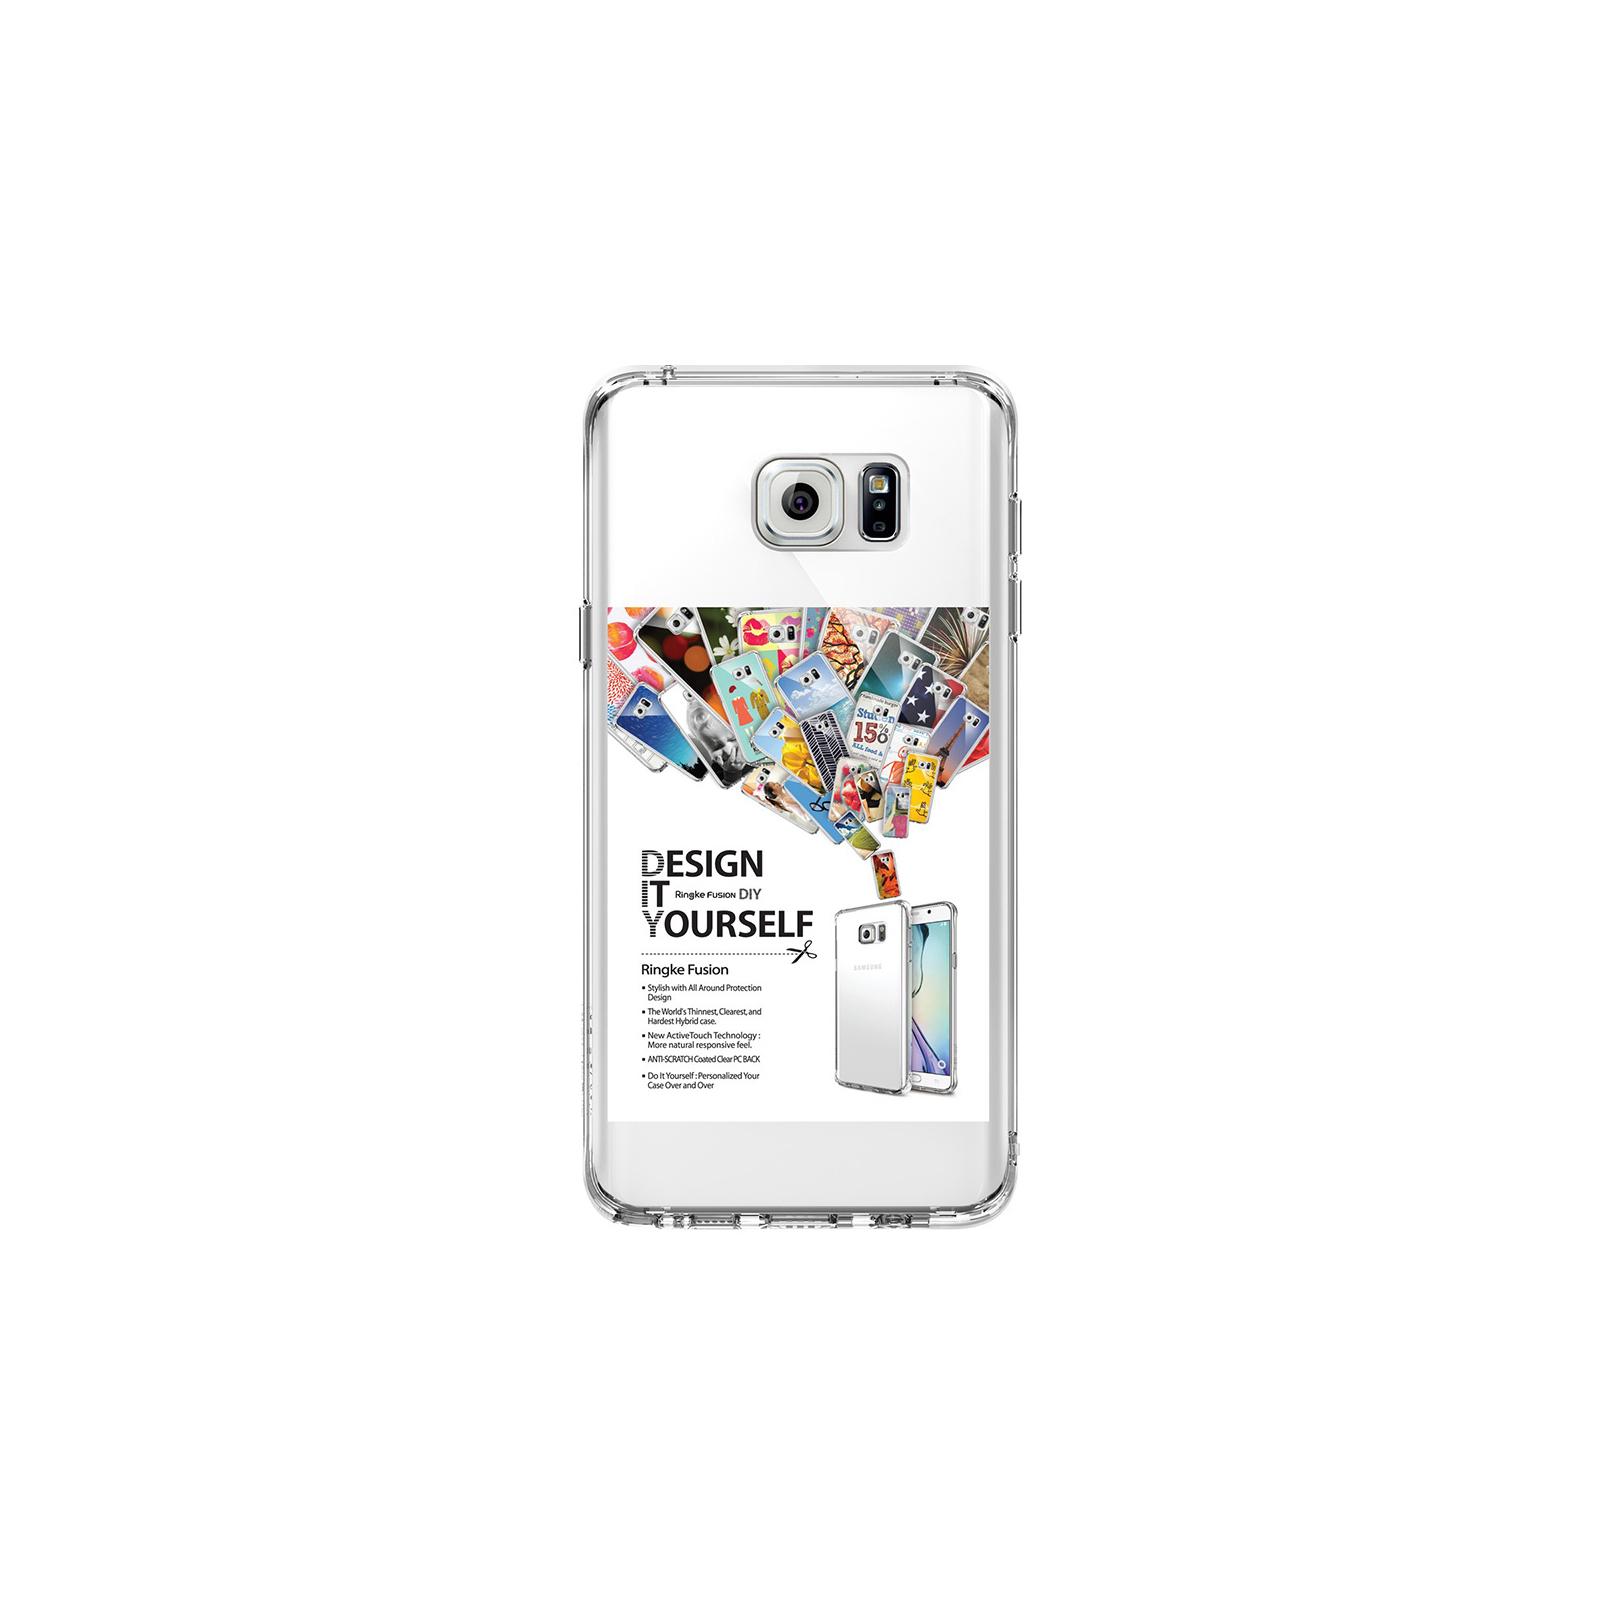 Чехол для моб. телефона Ringke Fusion для Samsung Galaxy Note 5 (Crystal View) (171076) изображение 2